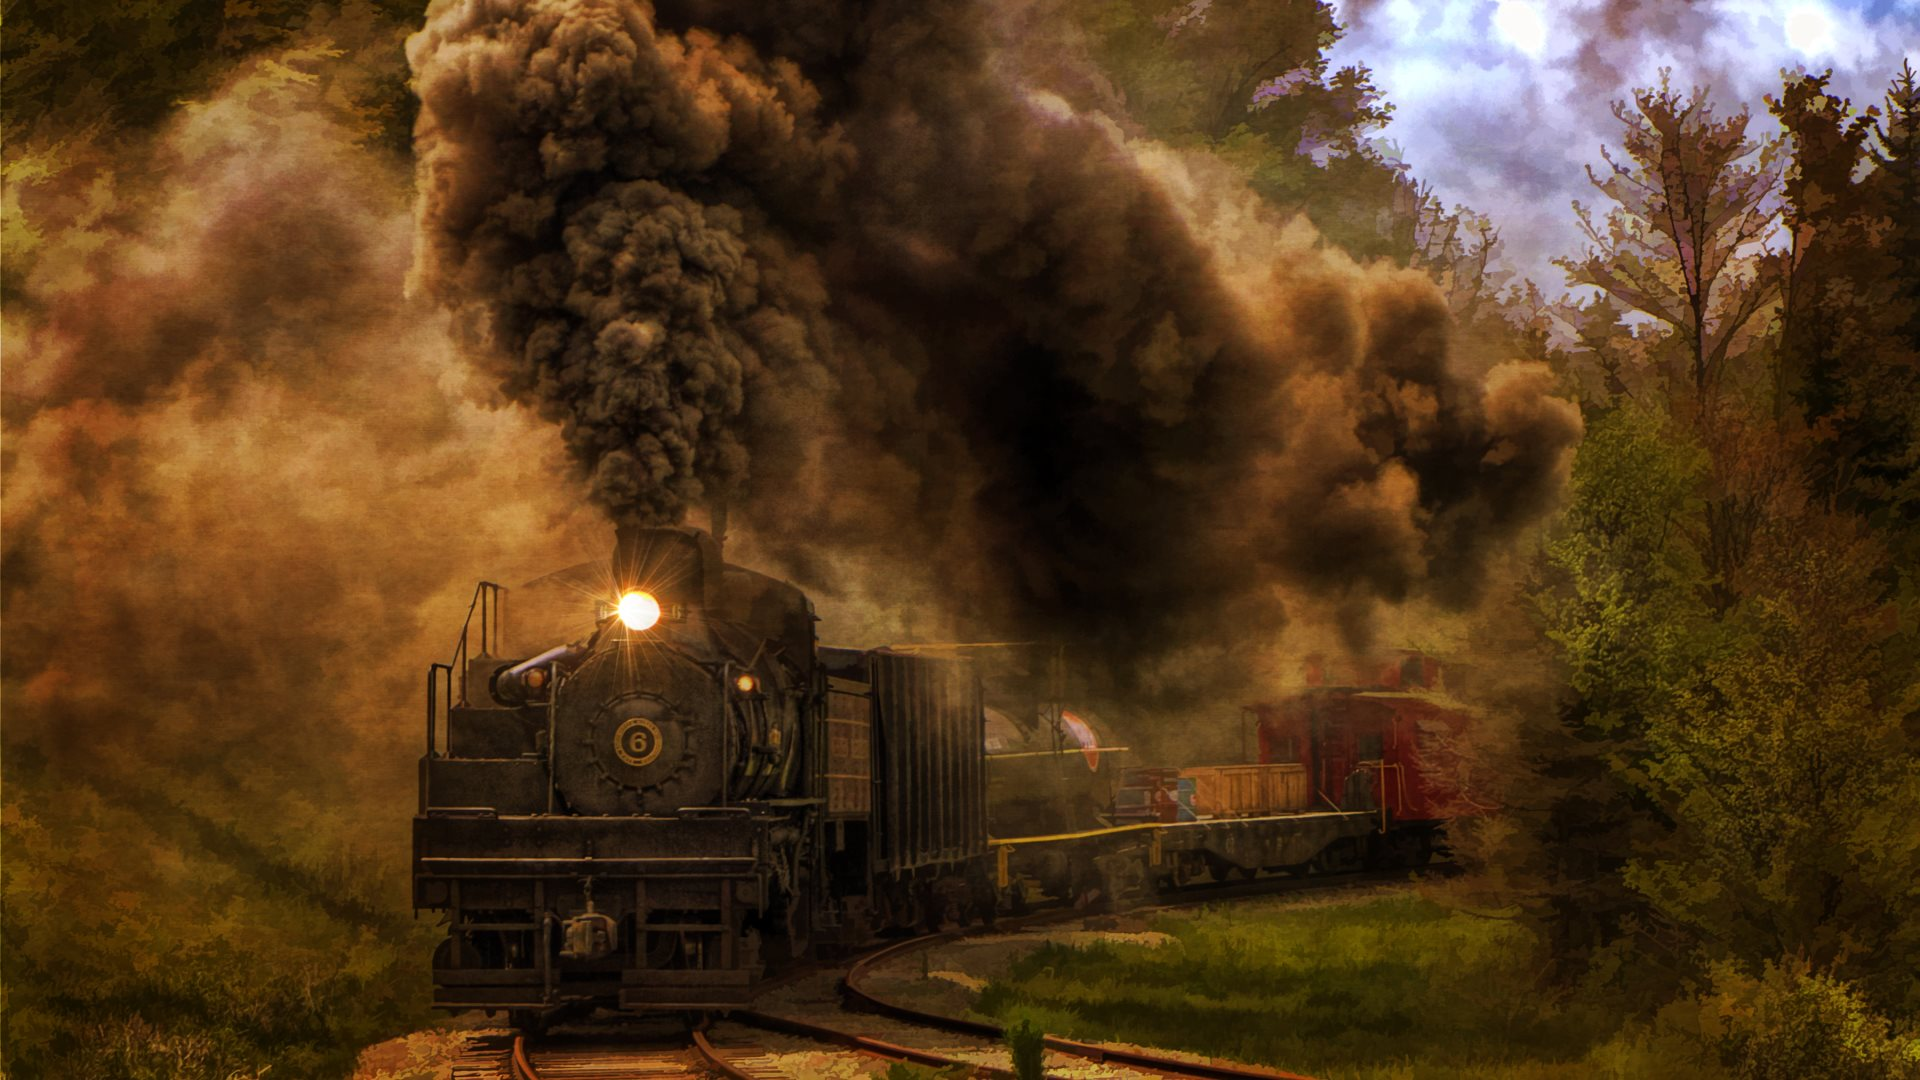 steam locomotive hd wallpapers - photo #15